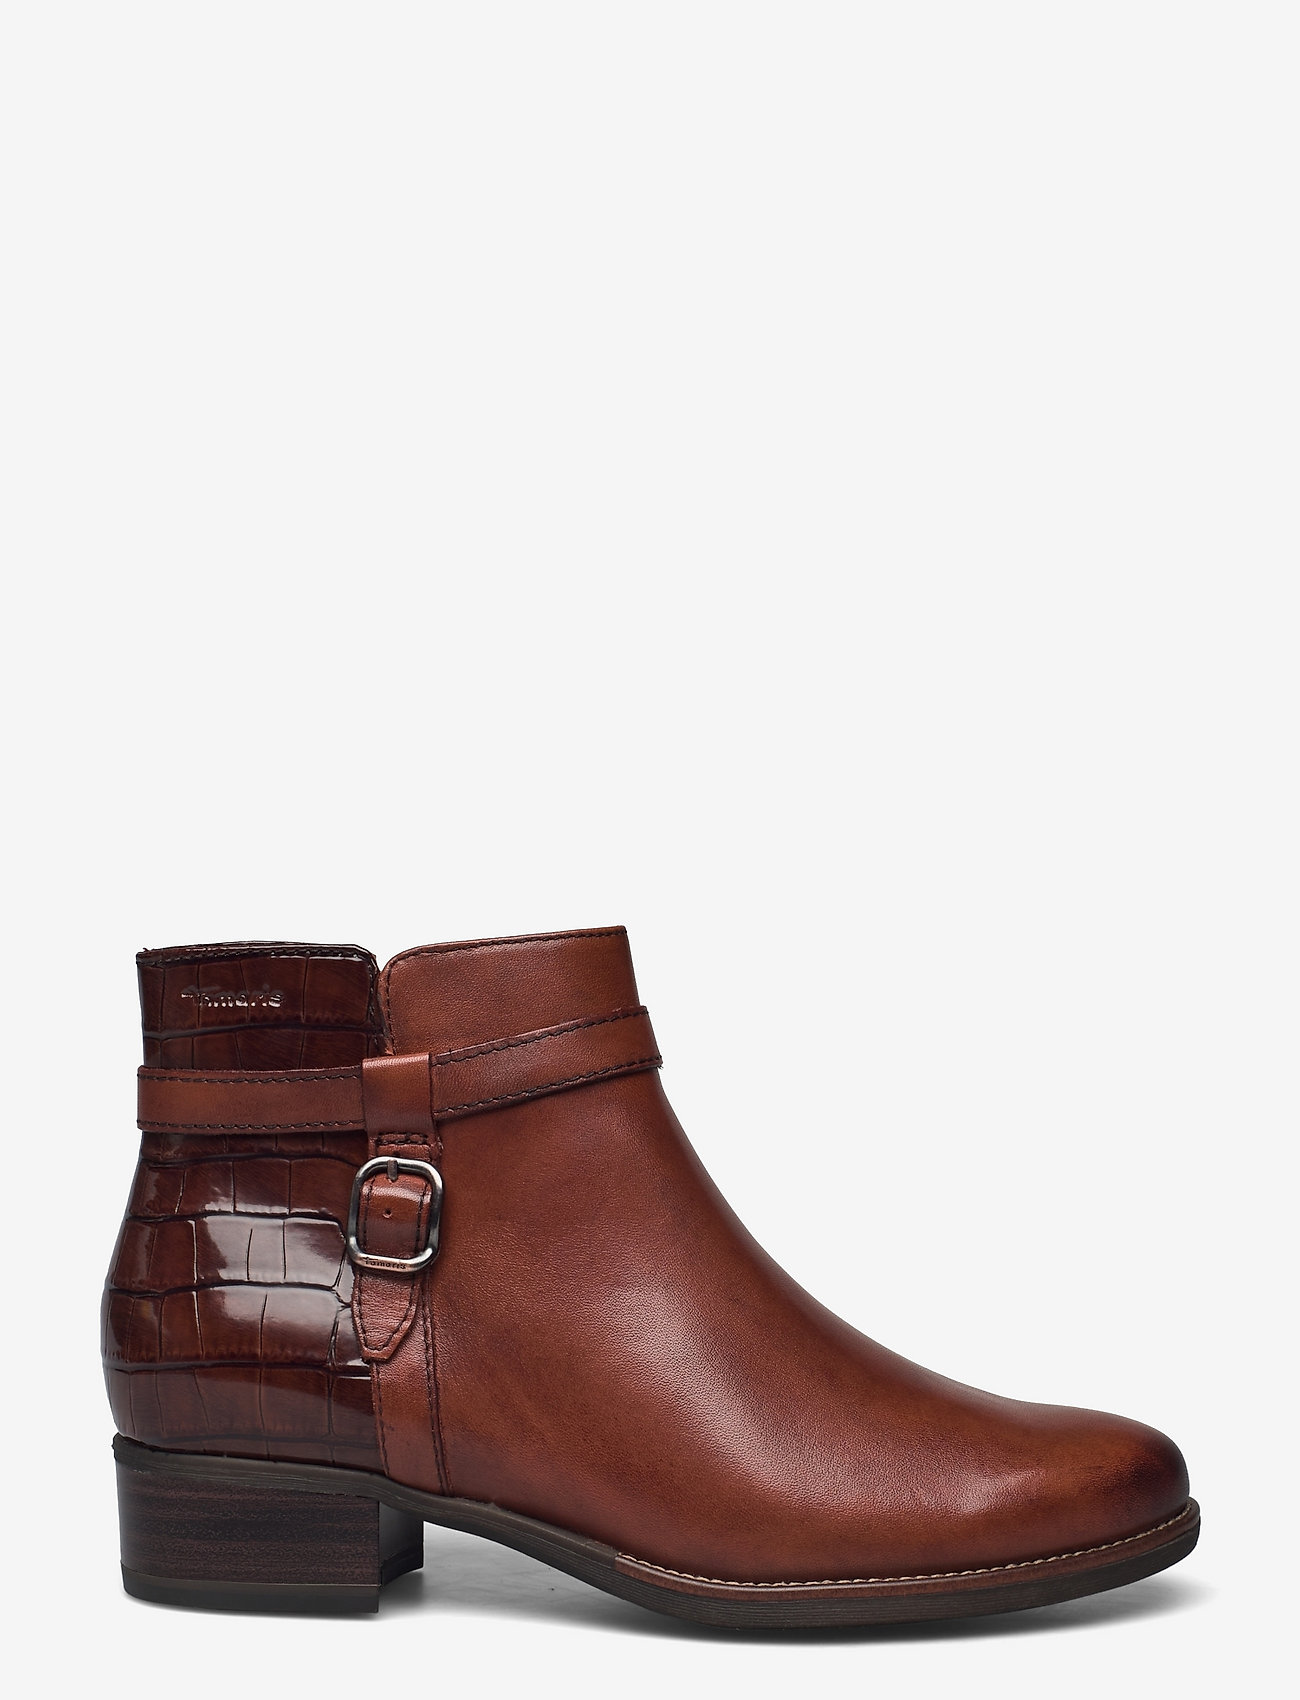 Tamaris - Woms Boots - Marly - puszābaki bez papēža - chestnut comb - 1